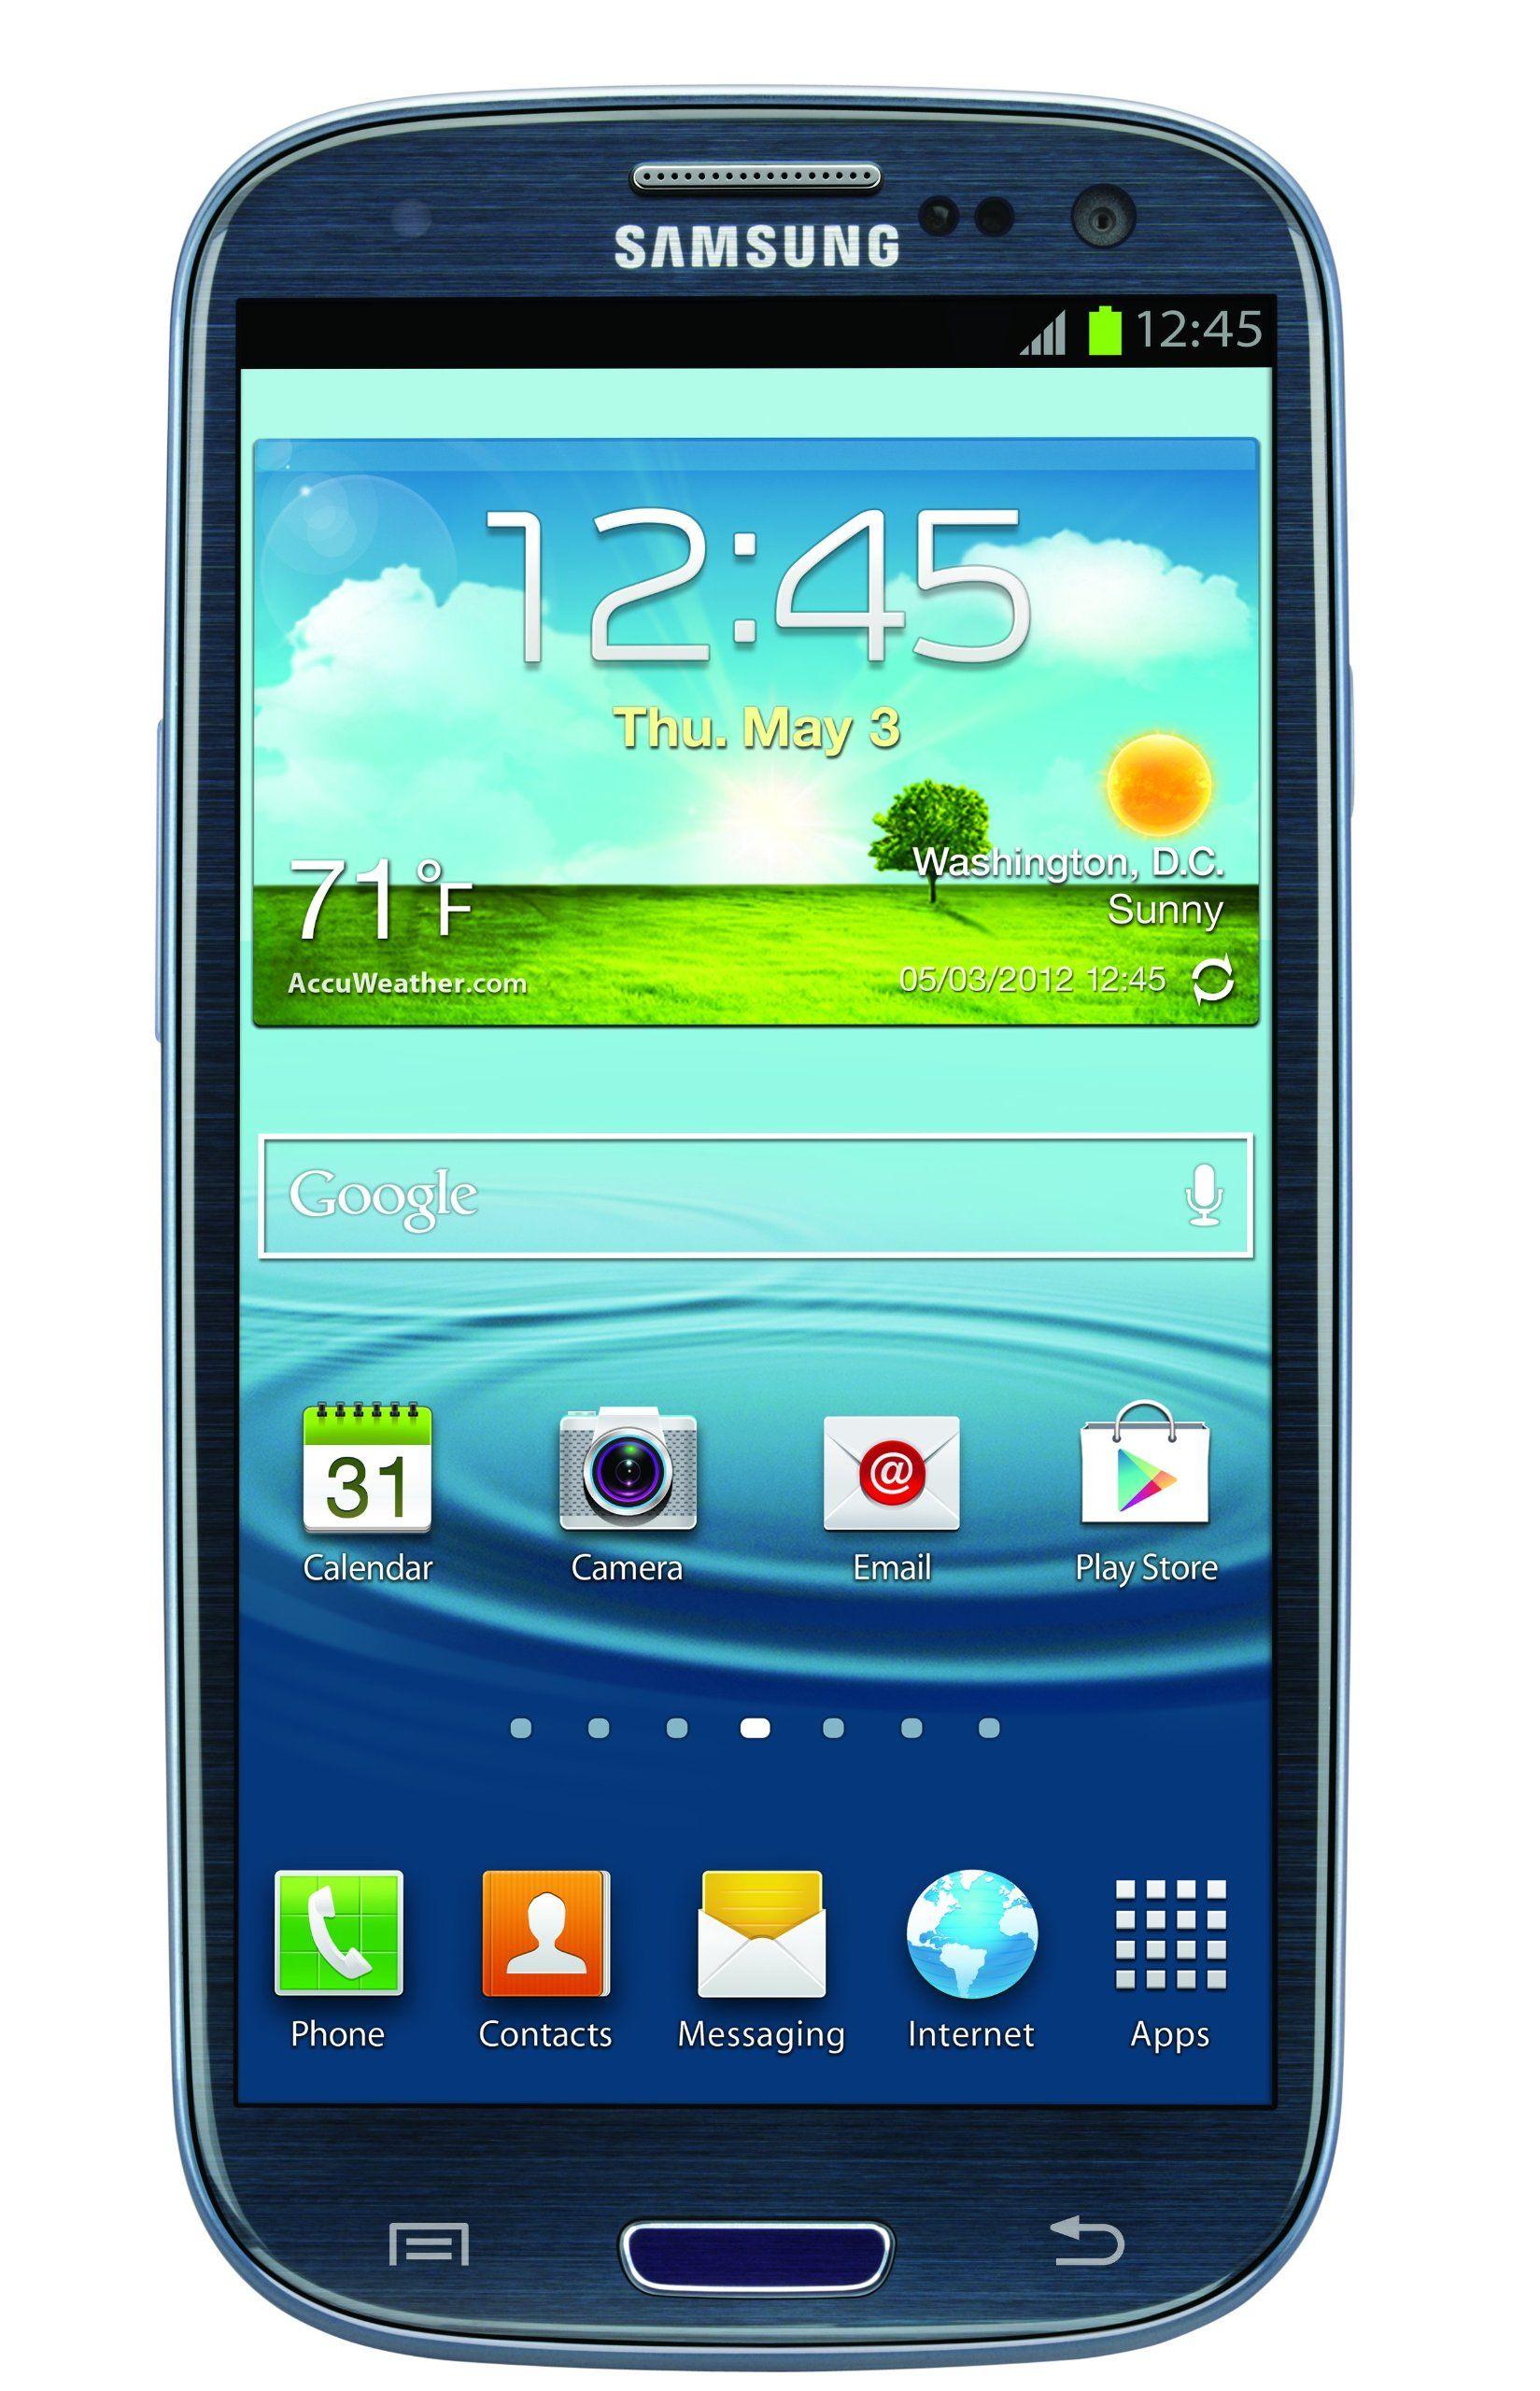 Samsung Galaxy S3, Blue 16GB (AT&T) Samsung galaxy s3